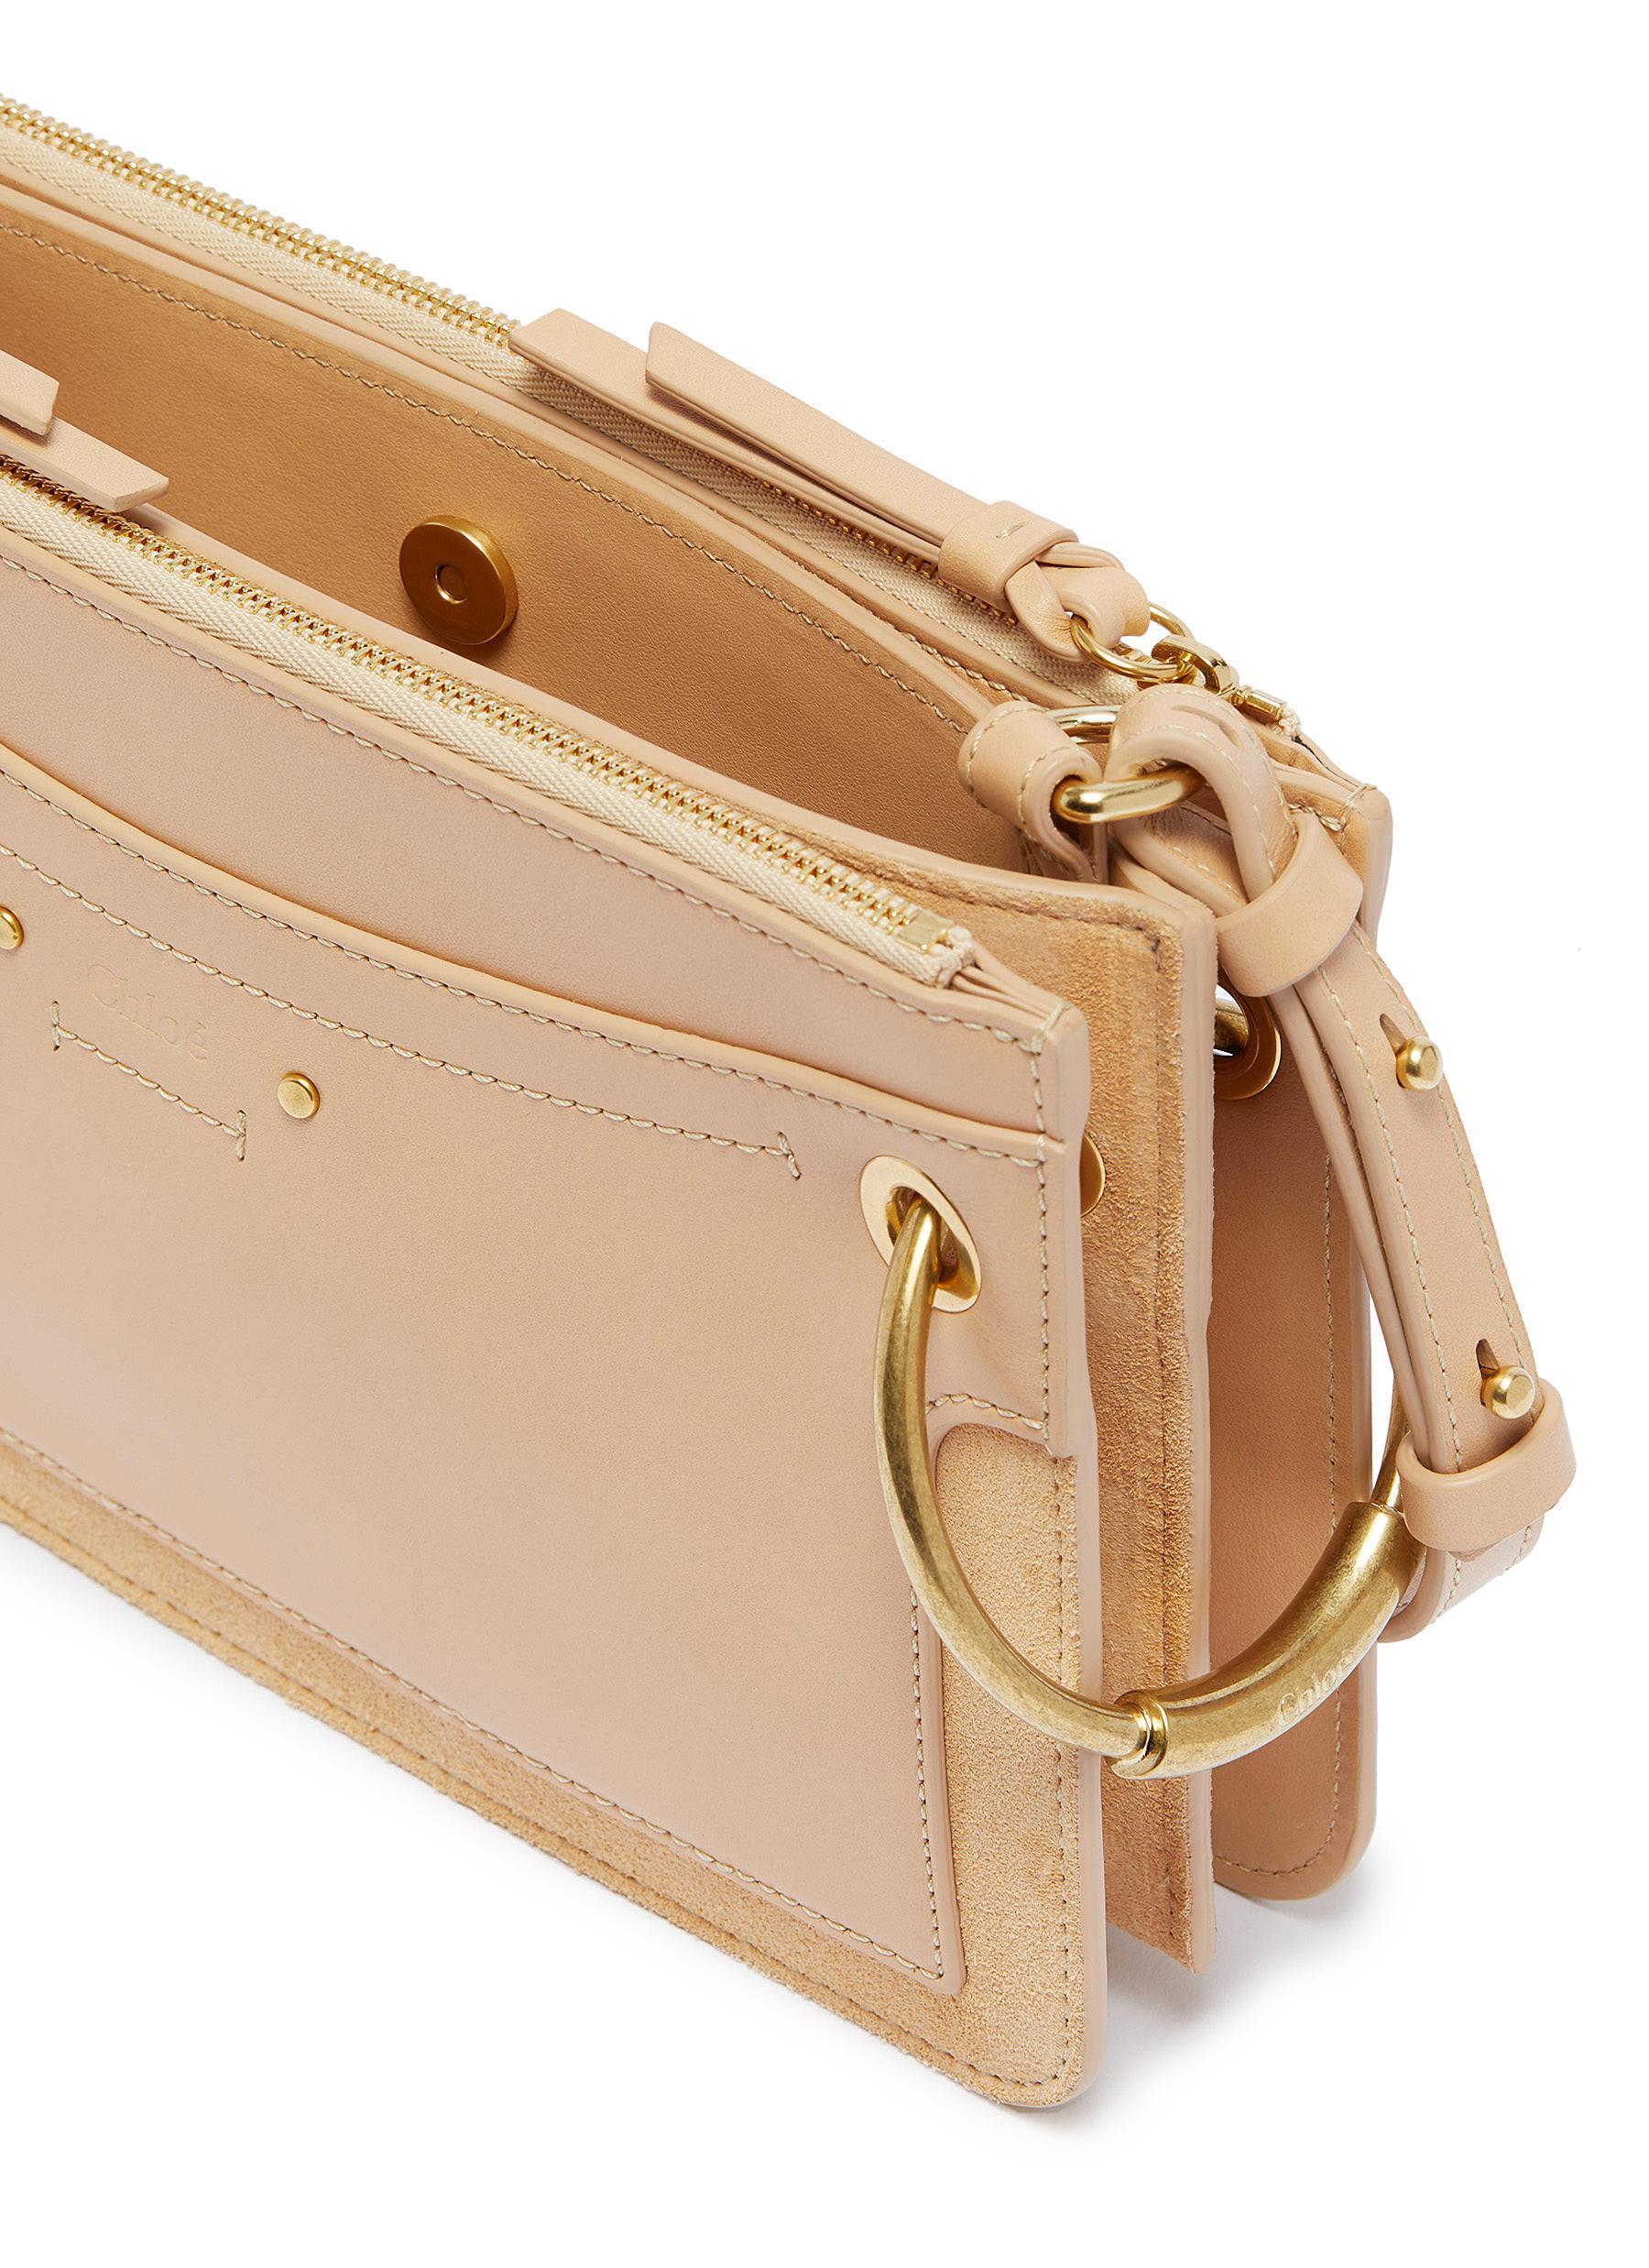 6dcd90c3e Chloé - Multicolor 'roy' Ring Suede Panel Mini Leather Crossbody Bag -  Lyst. View fullscreen